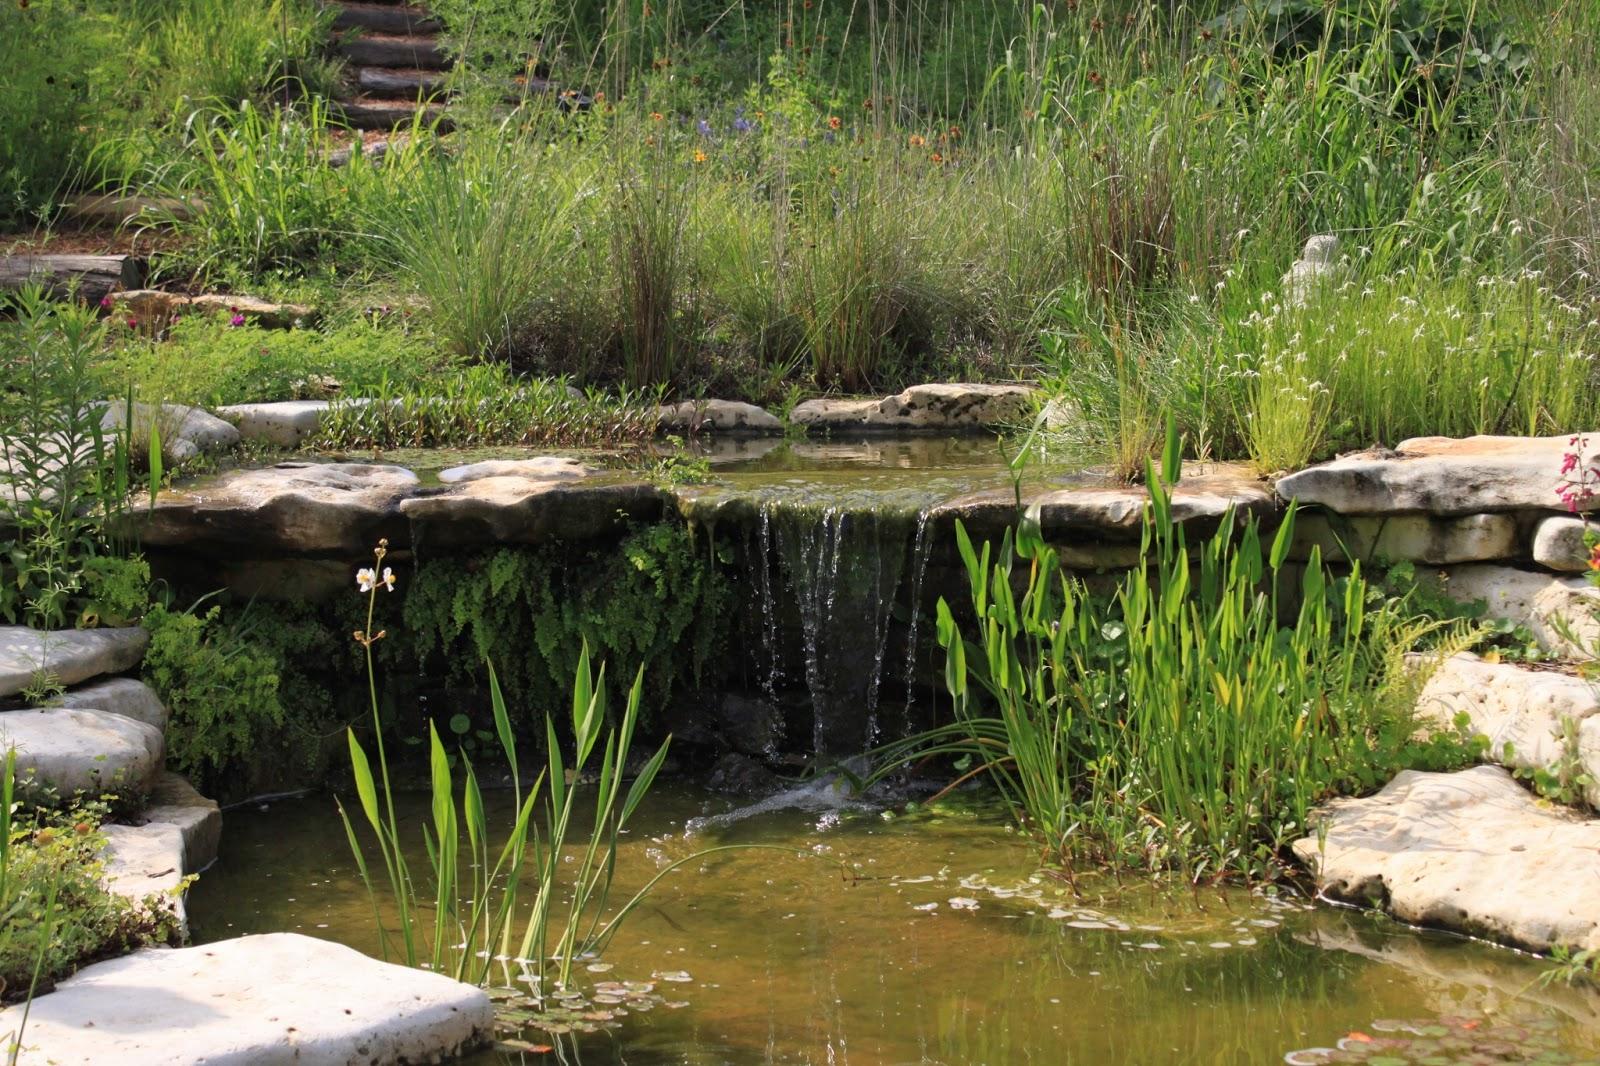 Natural Looking Backyard Ponds : RockOakDeer Gardens on Tour in Austin Westridge Drive